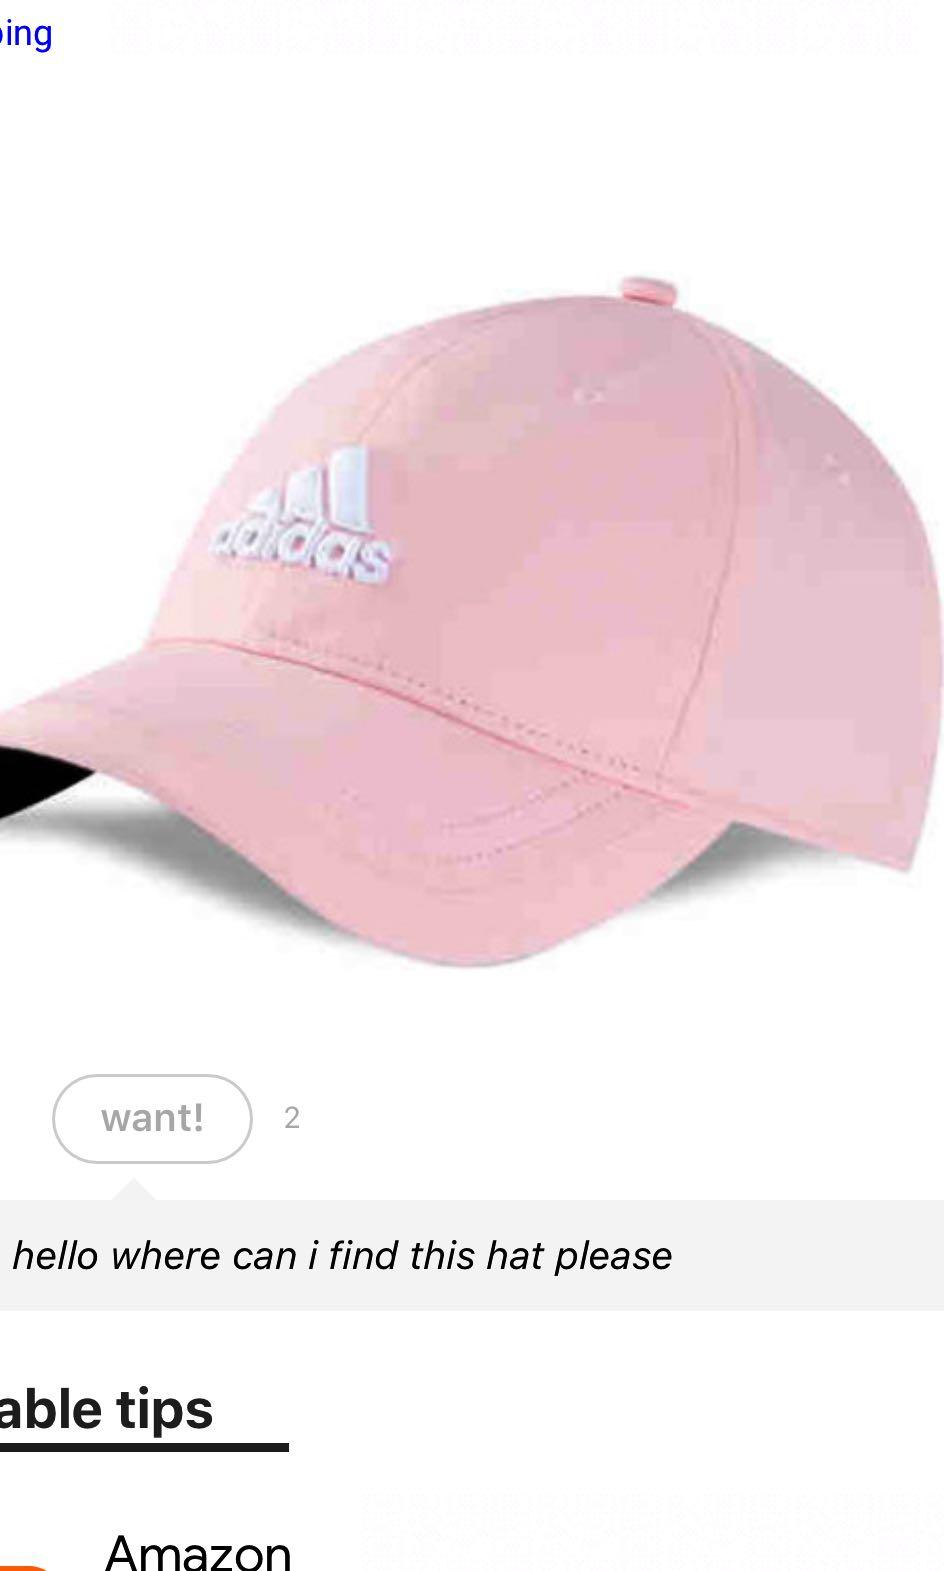 69325d6c4bd32 adidas pink hat